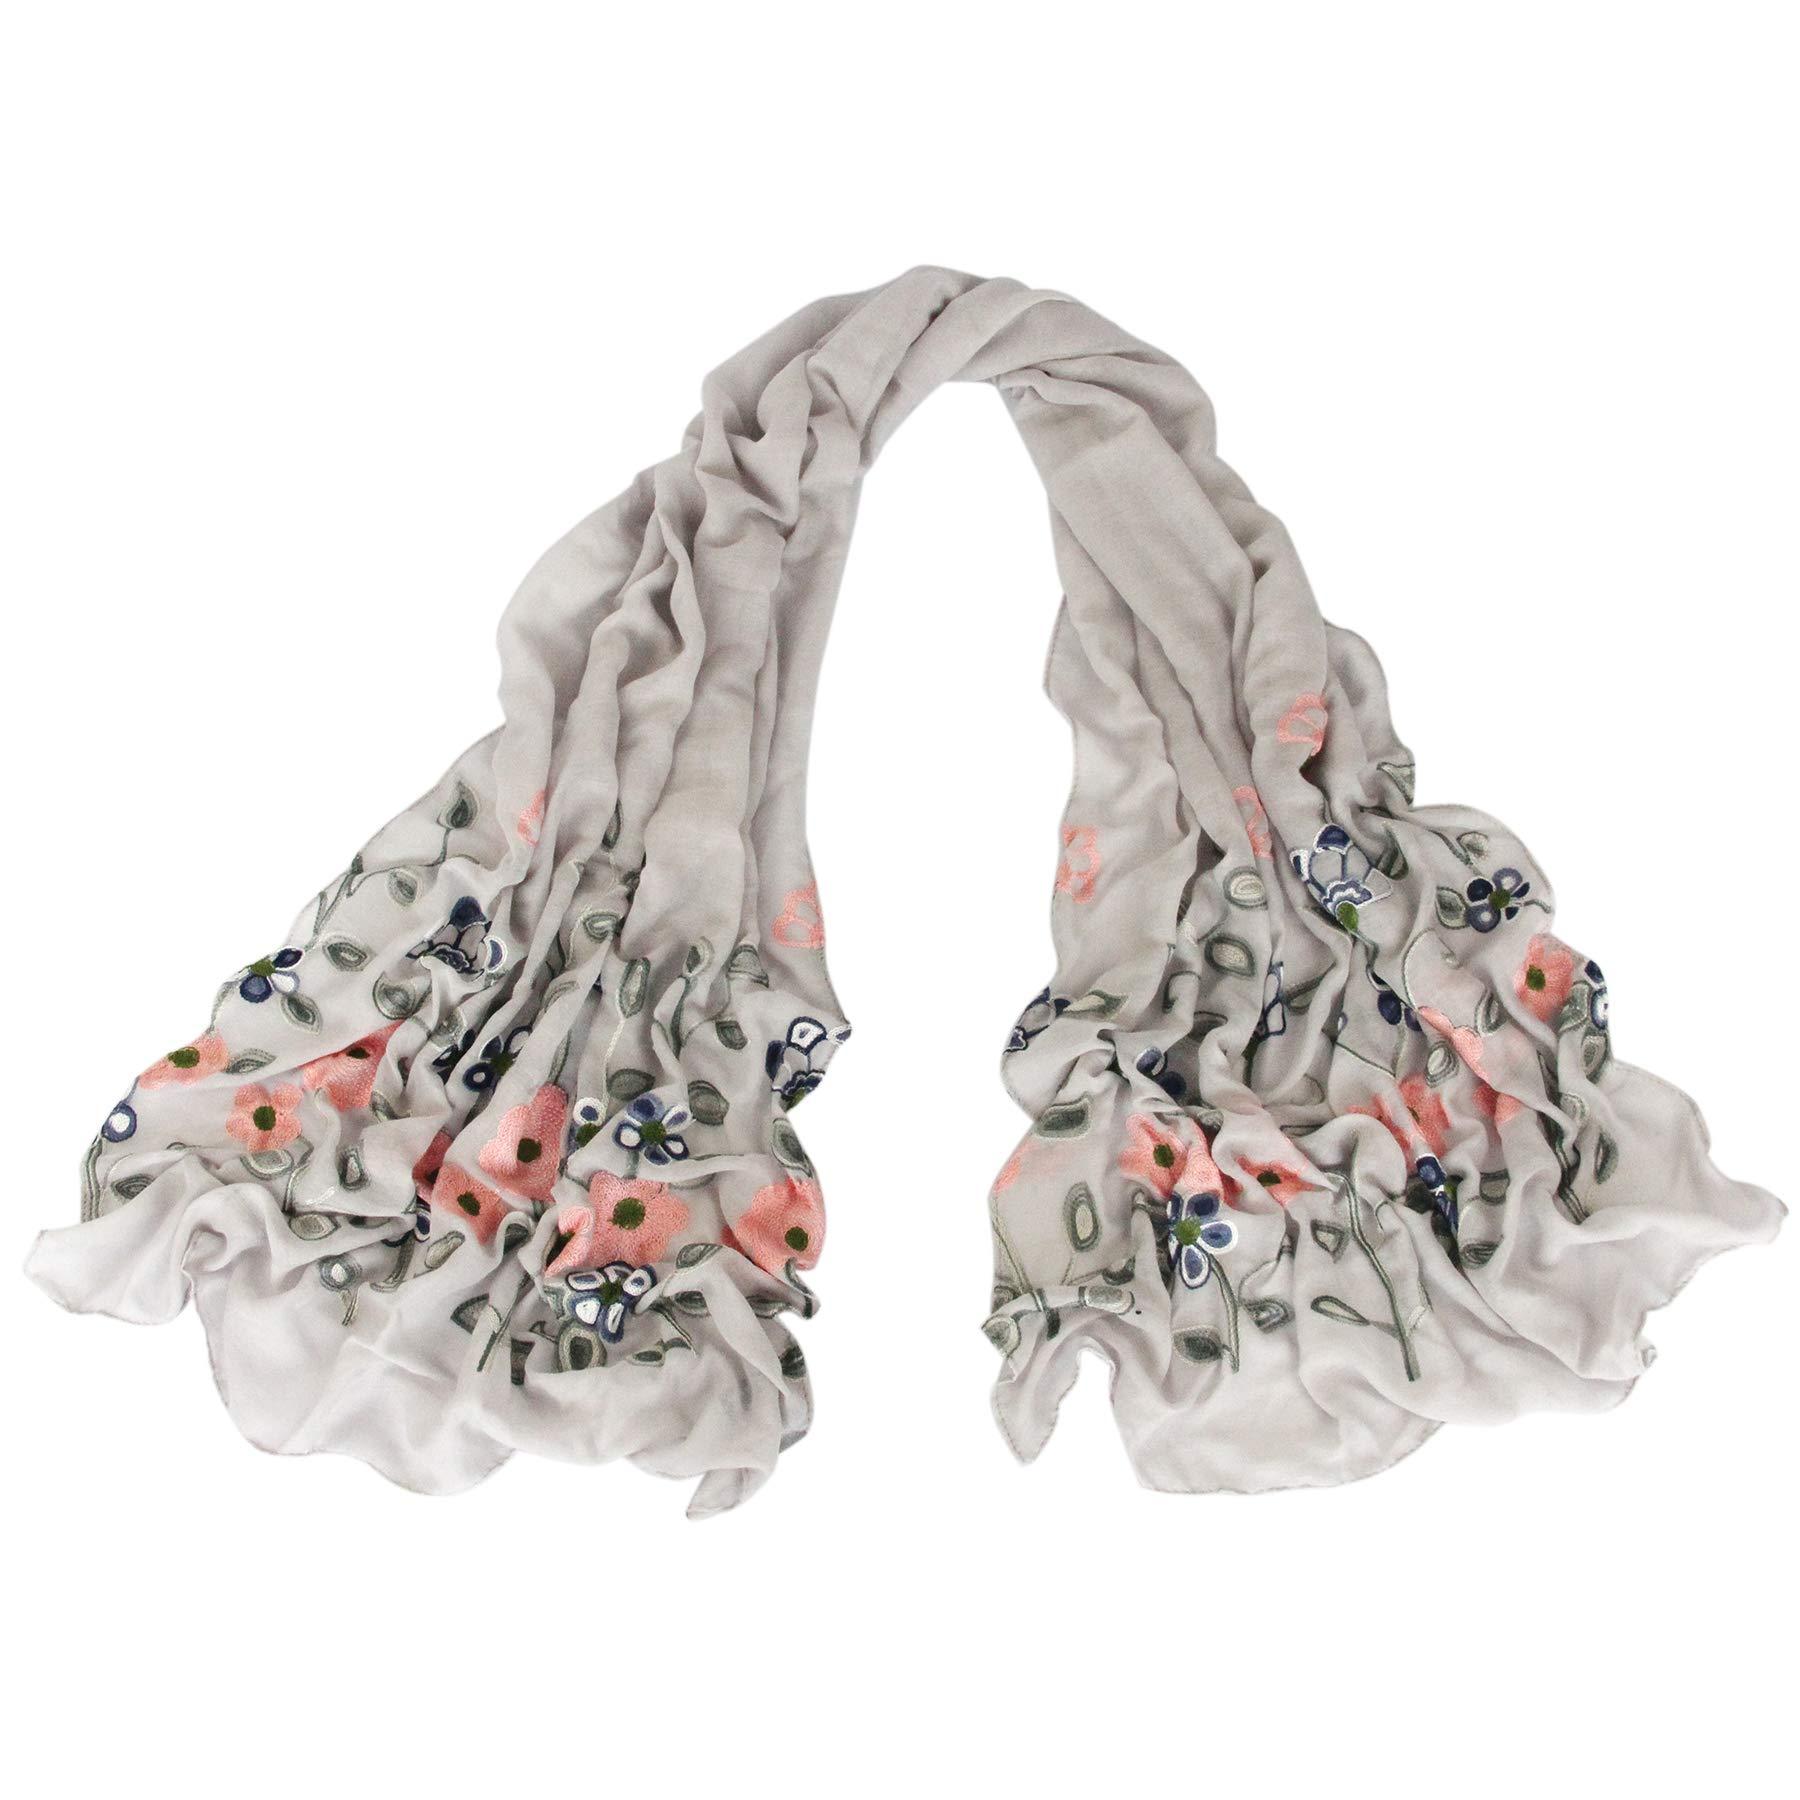 Women Lightweight Long Scarf - Grey Embroidery Soft Light Thin For Spring Summer Flower Wrap (Grey 185)